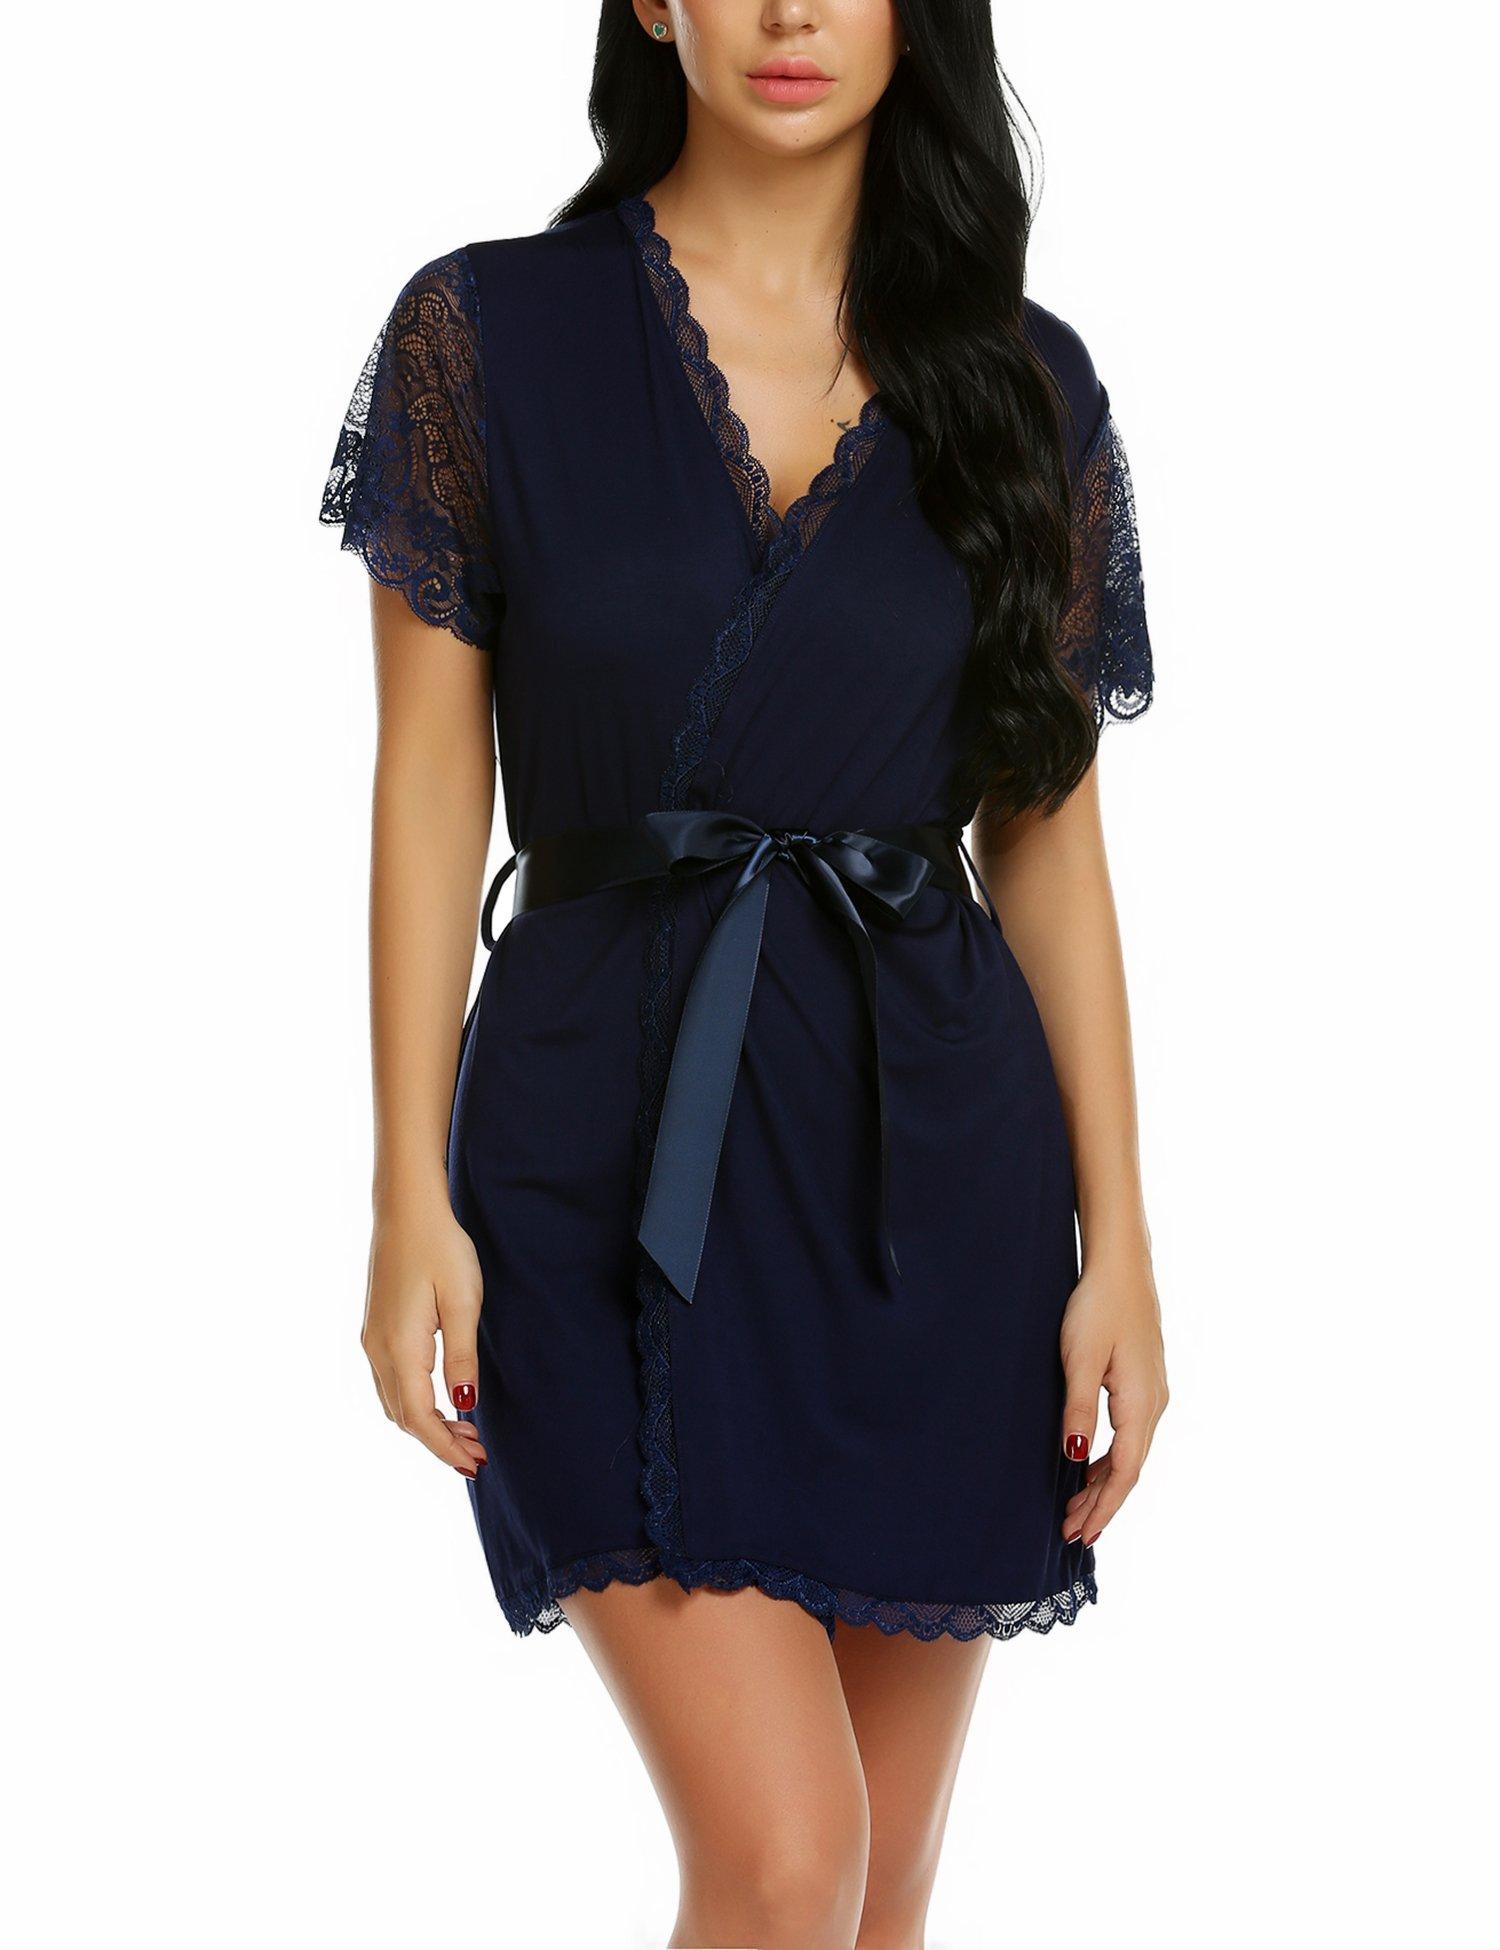 wearella Womens Short Robe Lace Trim Kimono Spa Knit Bathrobe Lightweight Loungewear Sleepwear Short